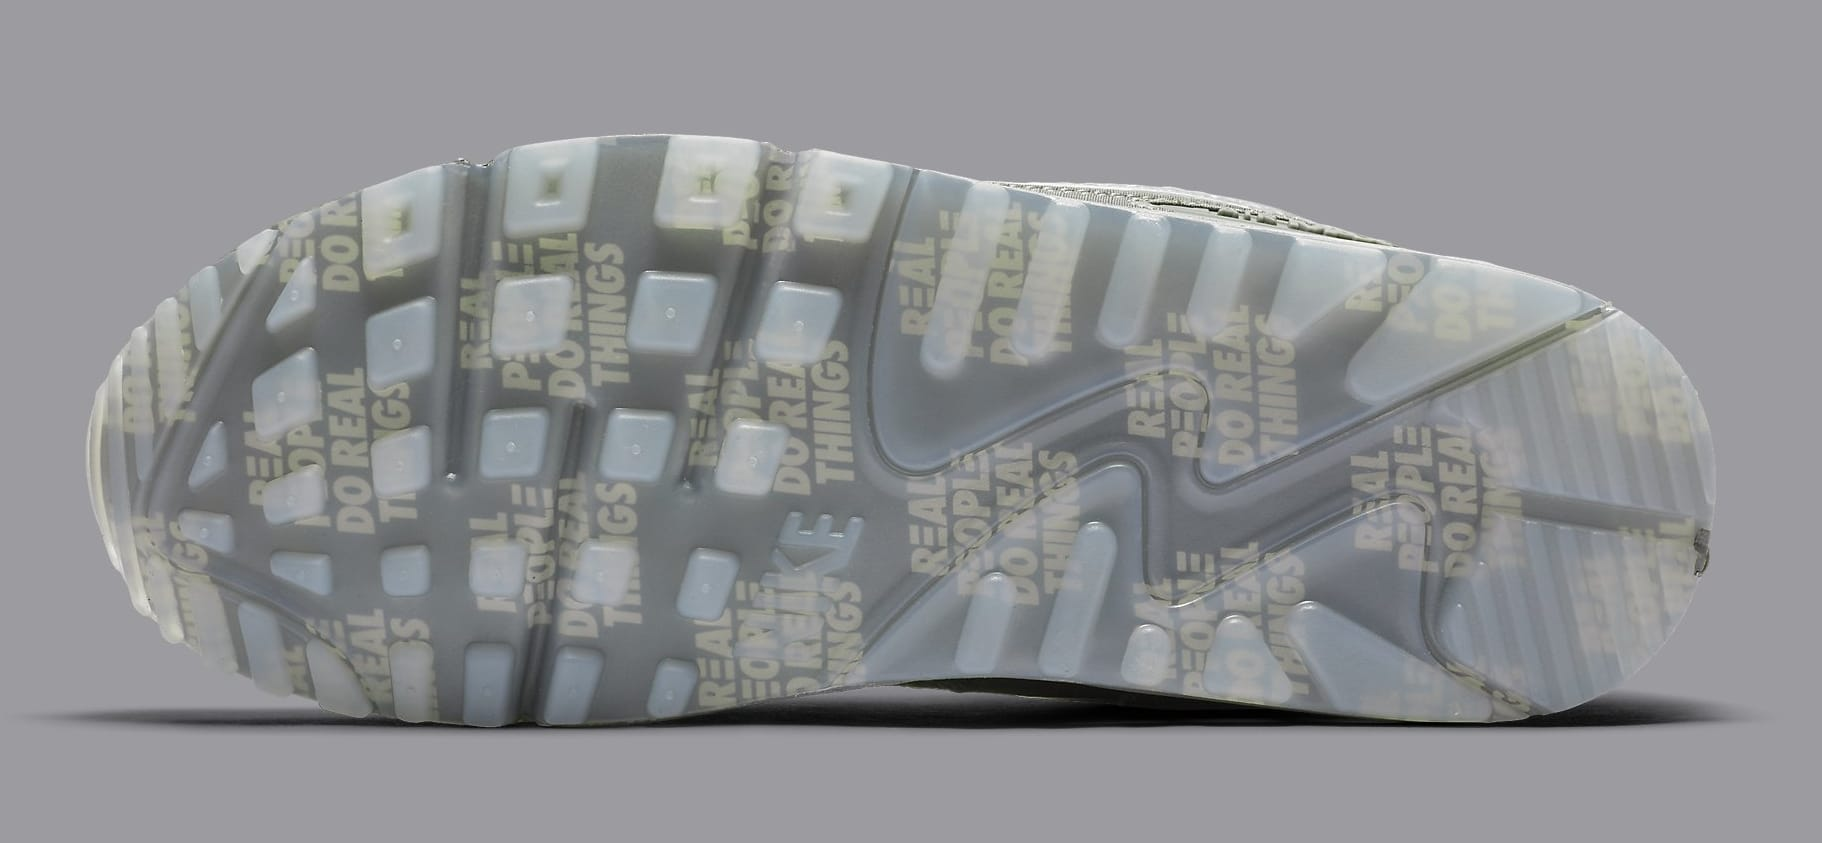 The Basement x Nike Air Max 90 CI9111 002 CI9111 003 Release